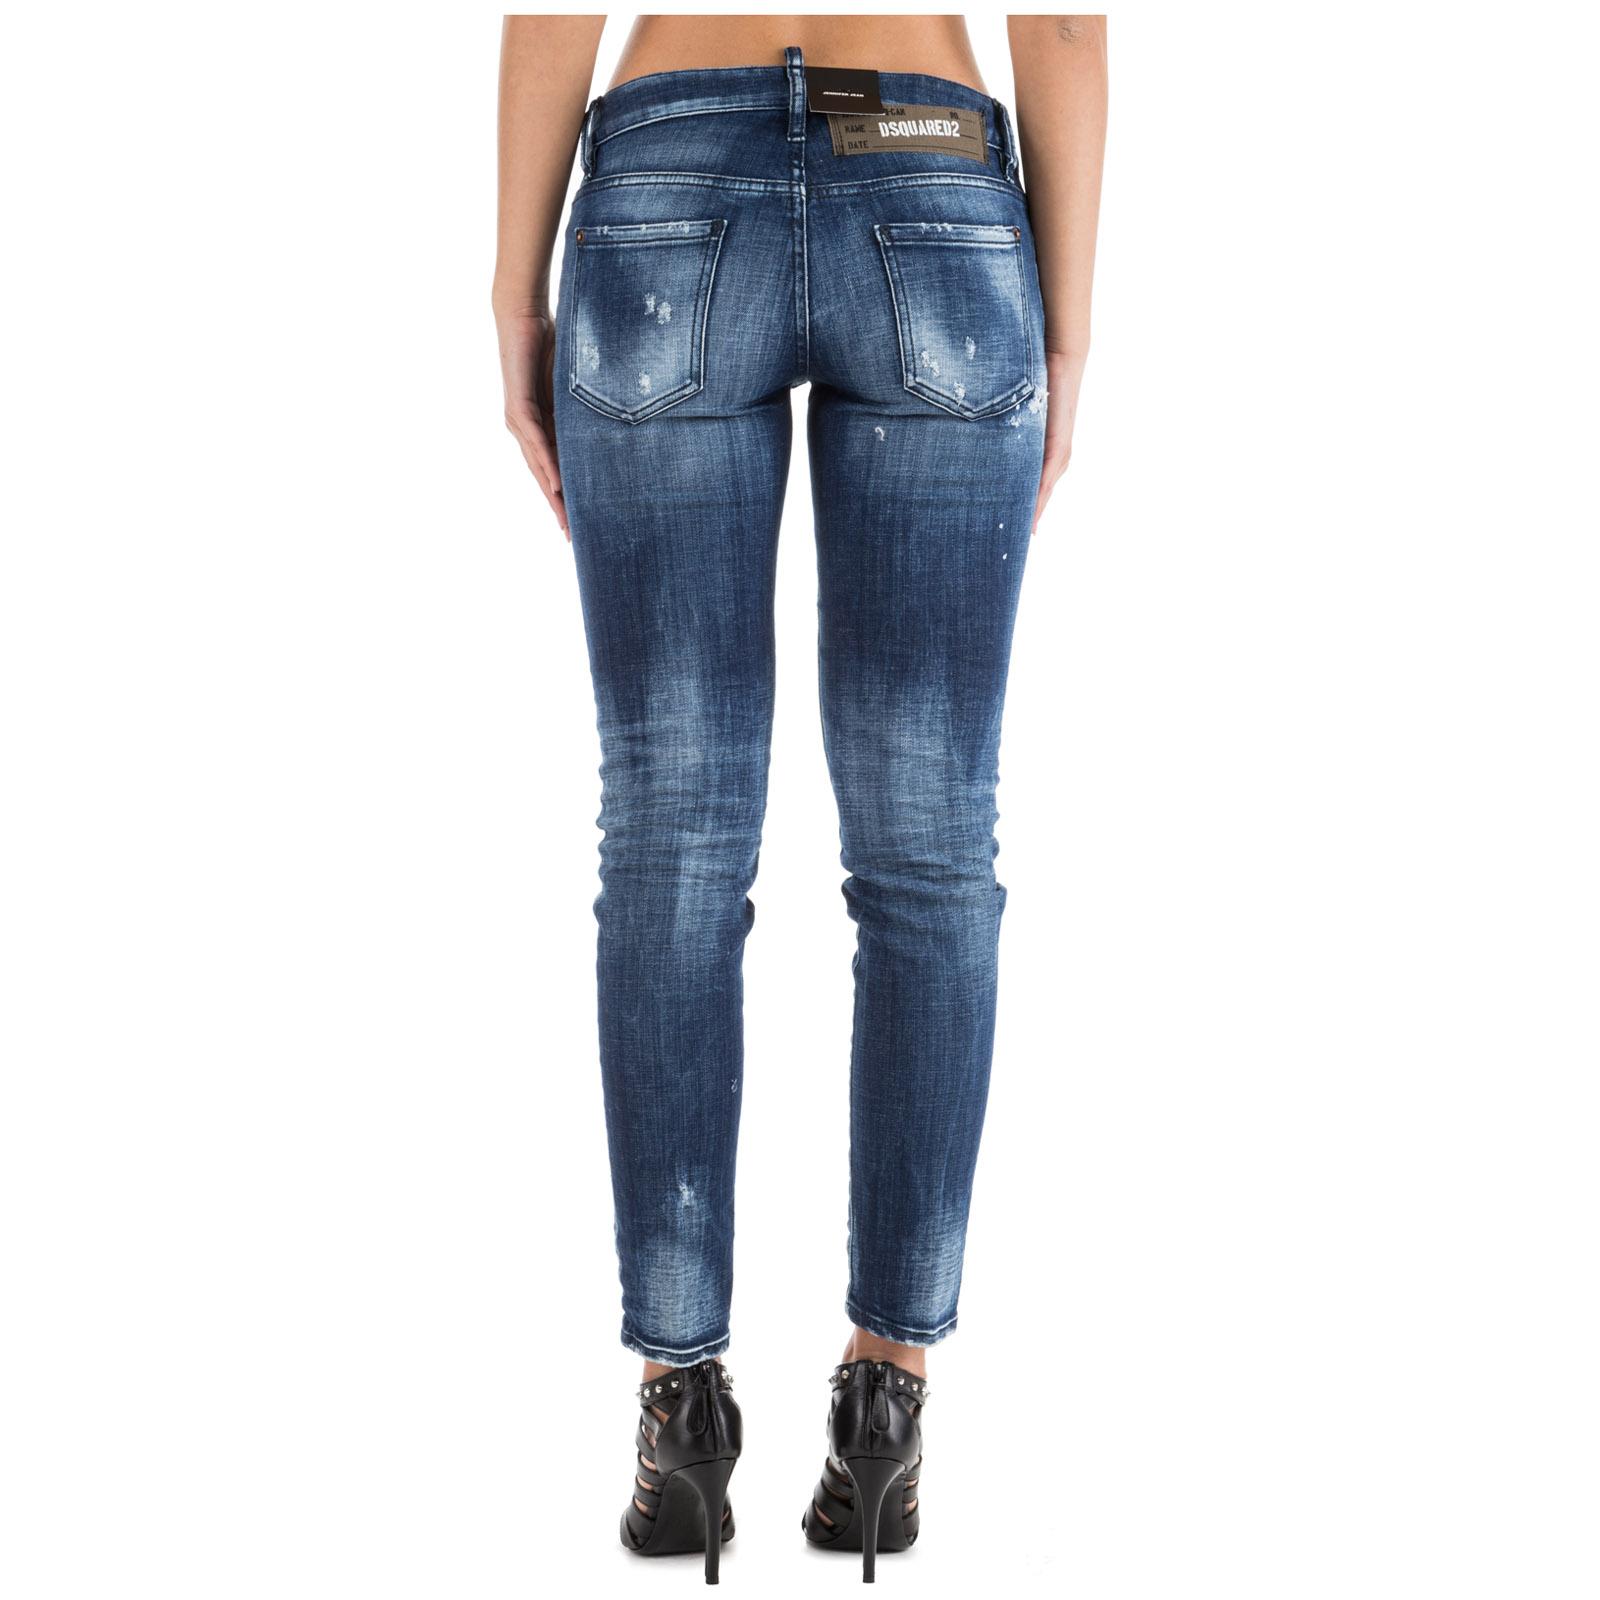 Jeans Dsquared2 S75LB0117S30342470 blu  9b2653e0d1c5